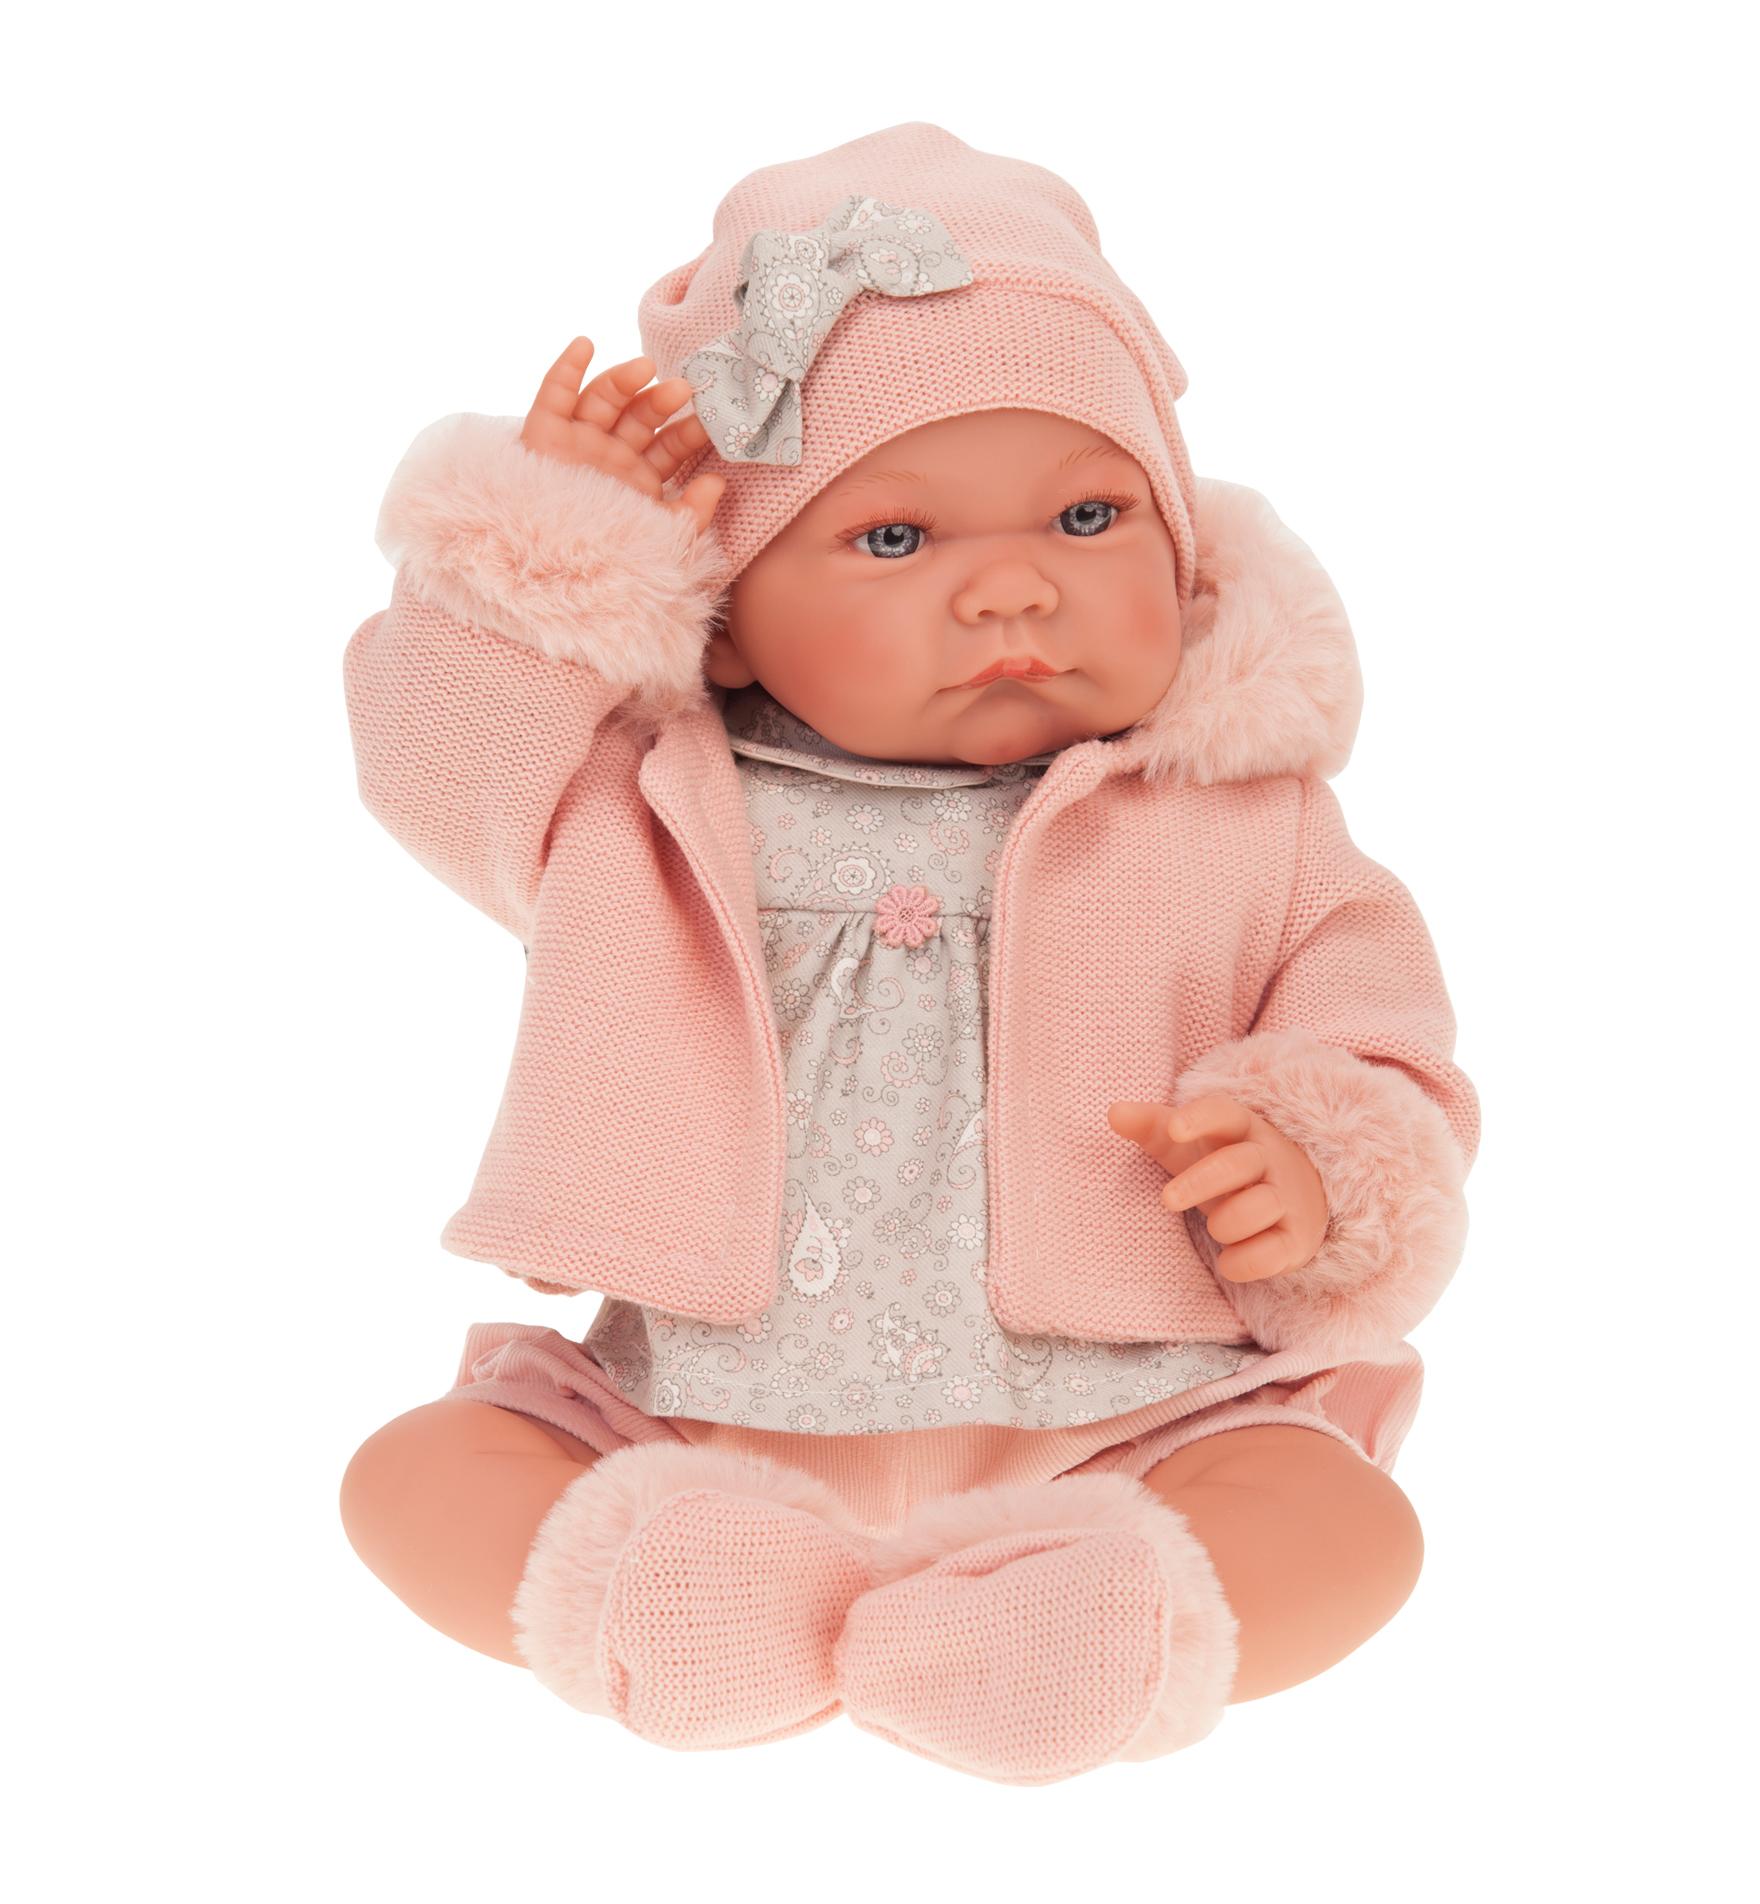 Antonio Juan 3378P Кукла Наталия в розовом,40см